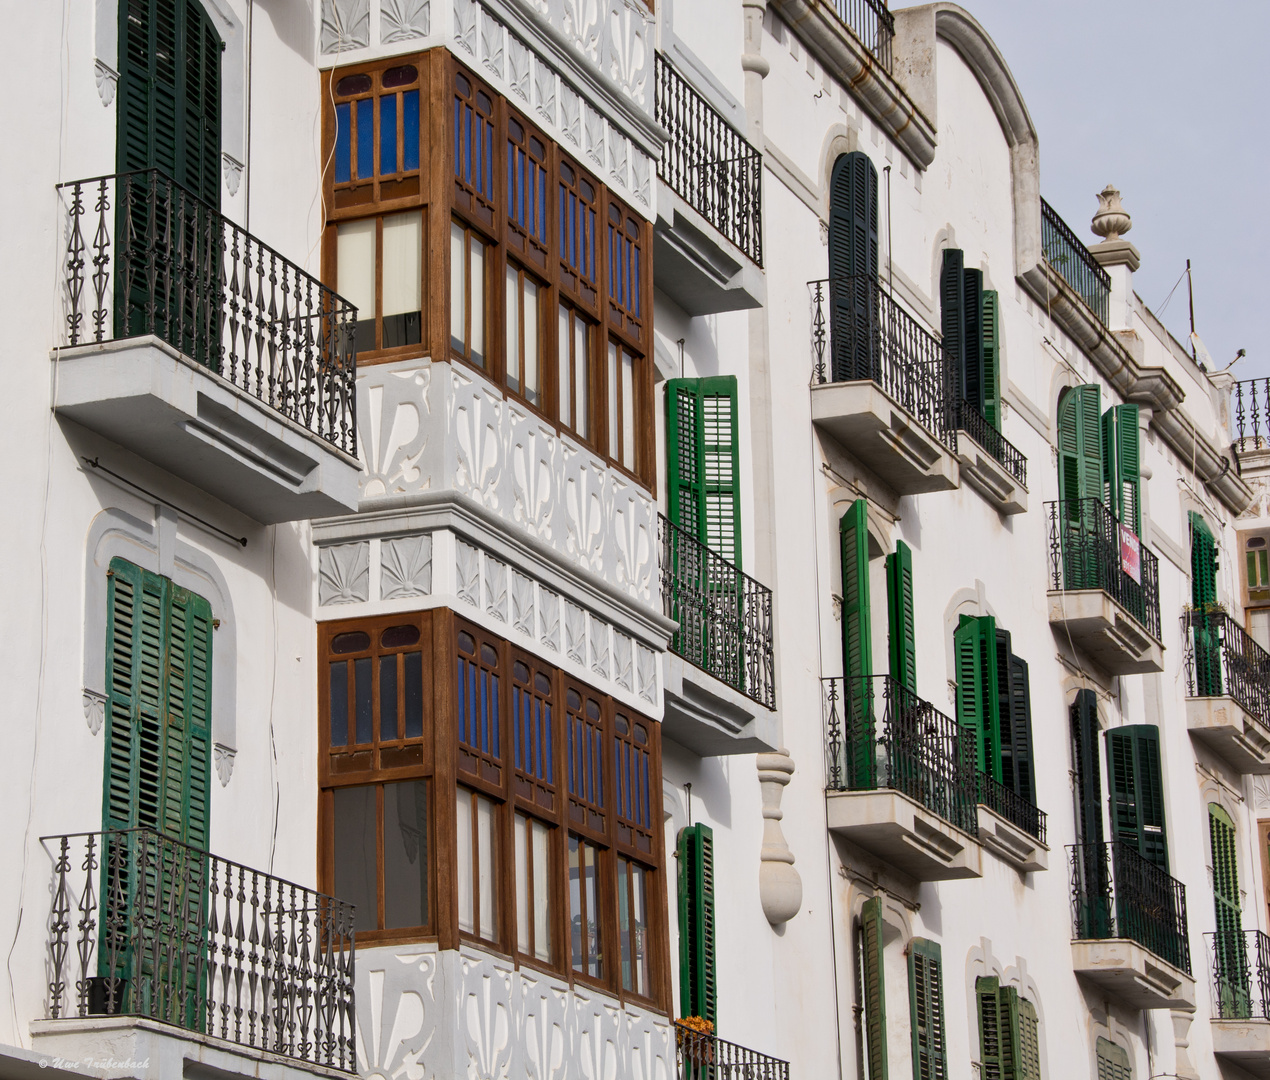 Ibiza-Architektur: Fassade am zentralen Platz Vara de Rey (4)